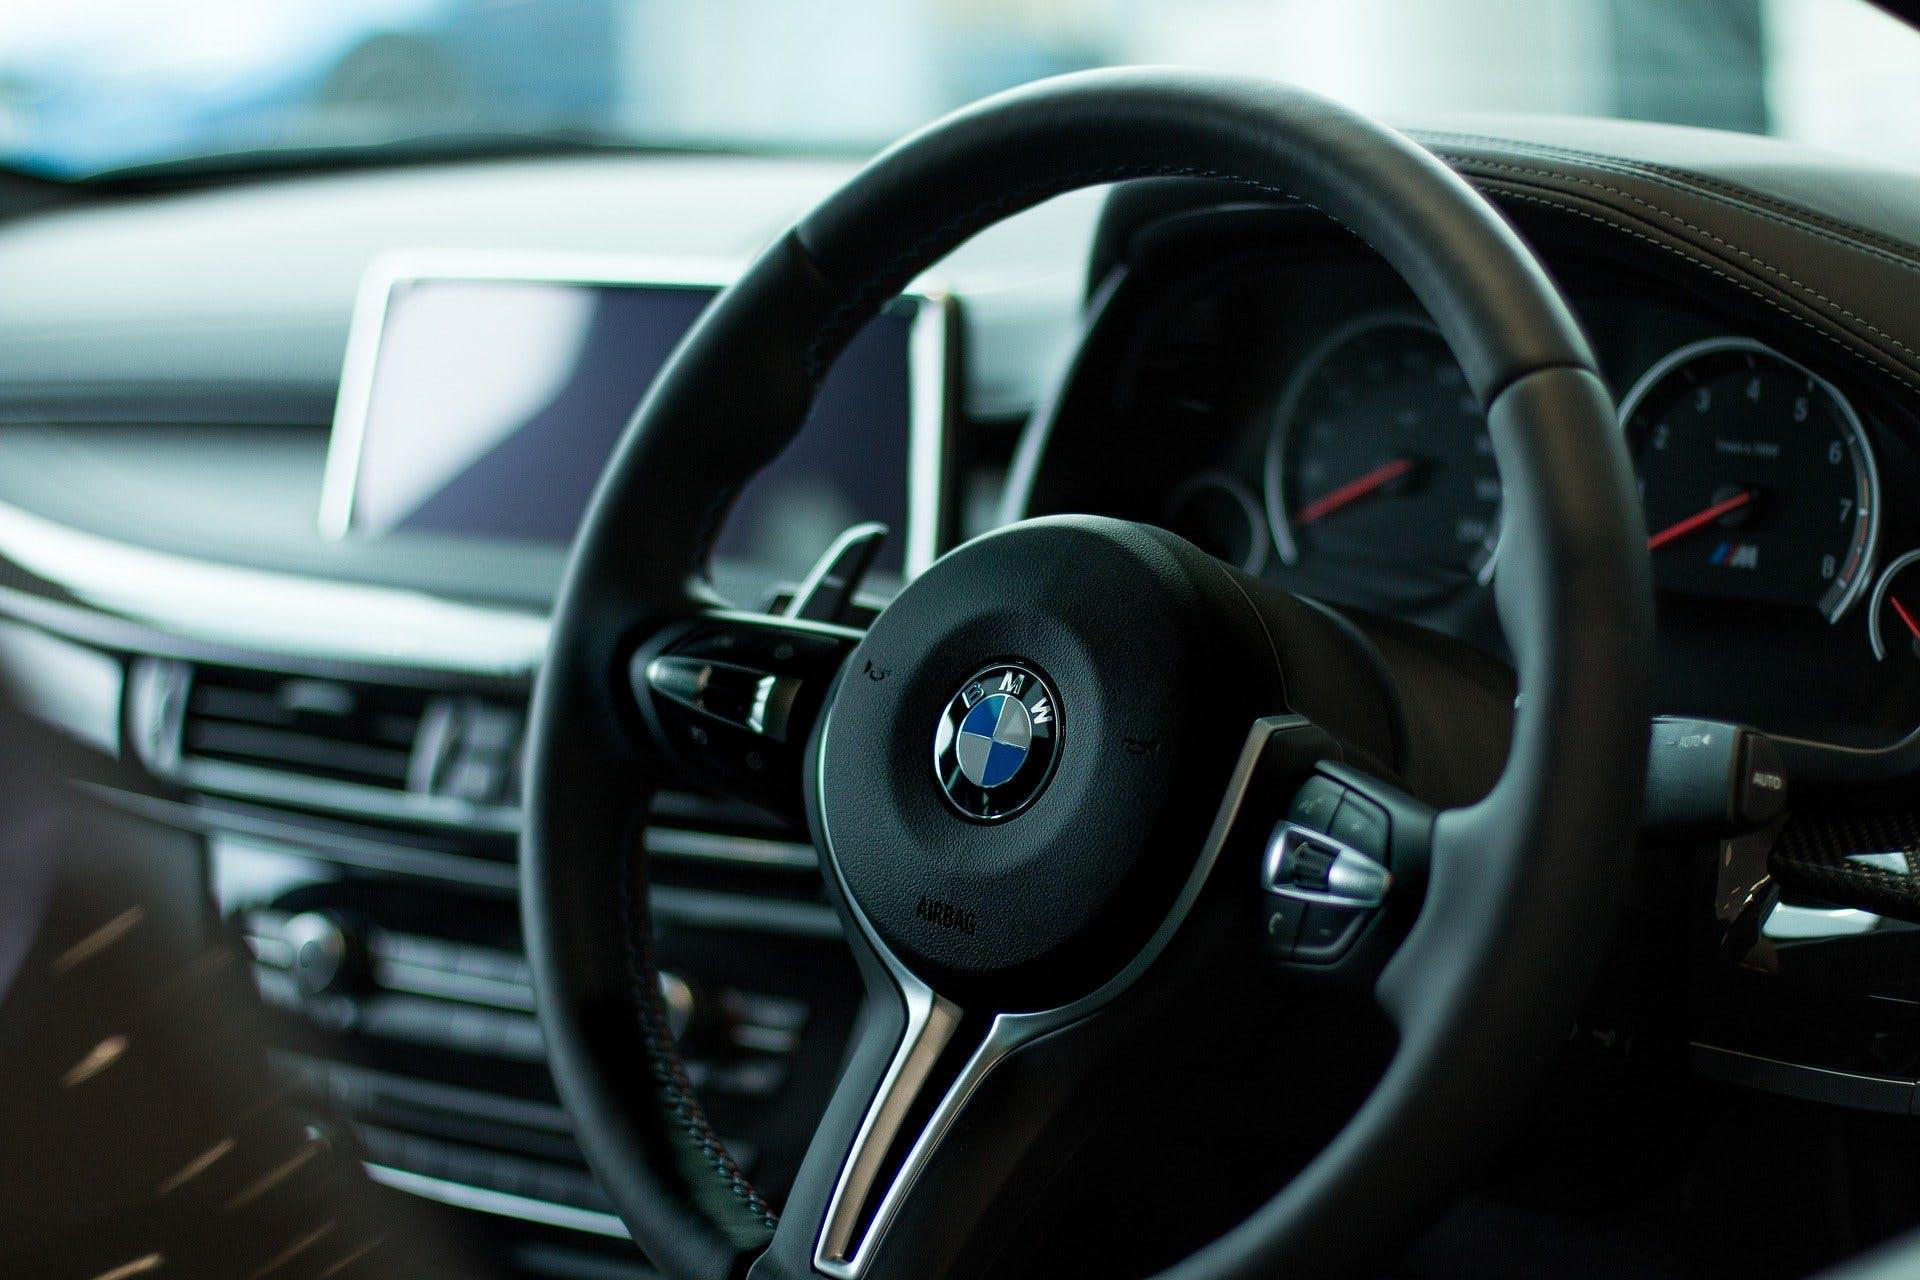 BMW Case Study Steering Wheel Image